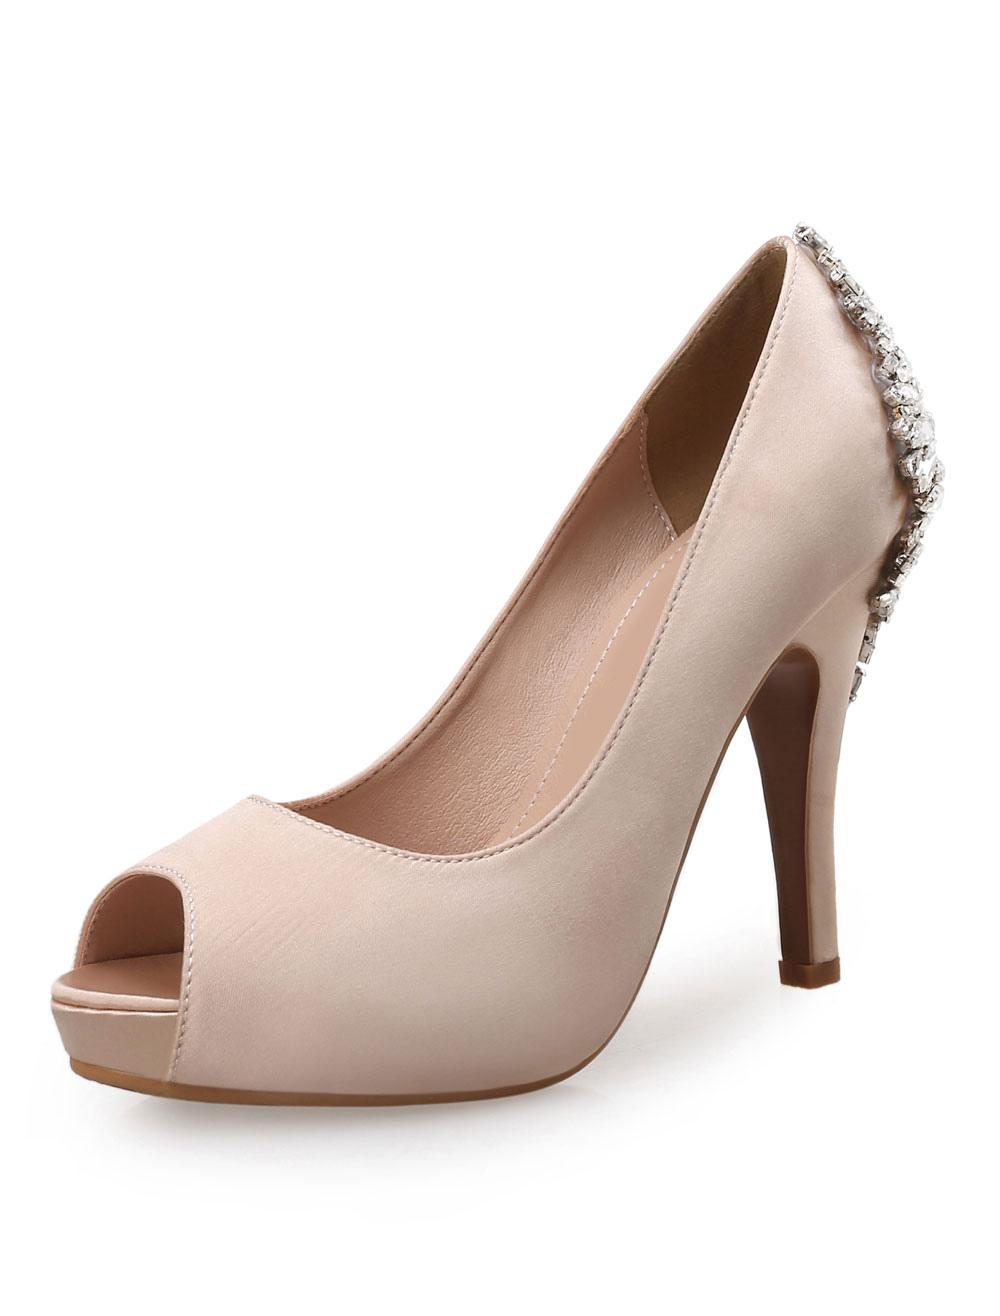 new styles c90f8 a642f Weiße Hochzeitsschuhe Satin Peep Toe Strass High Heel Abendschuhe Damen  Party Schuhe